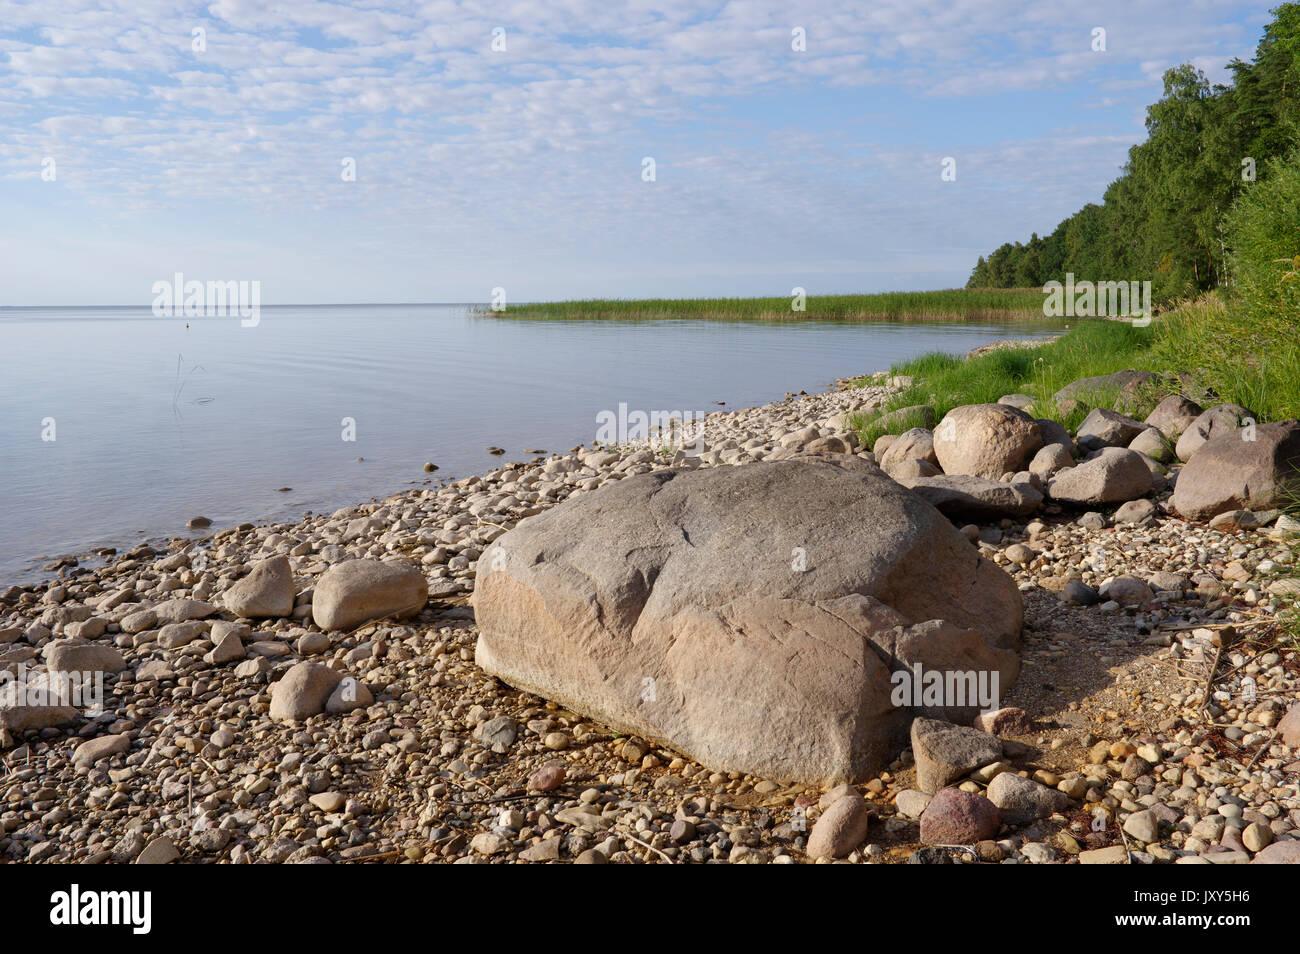 View to the Lake Võrtsjärv, Estonia 16.08.2017 - Stock Image